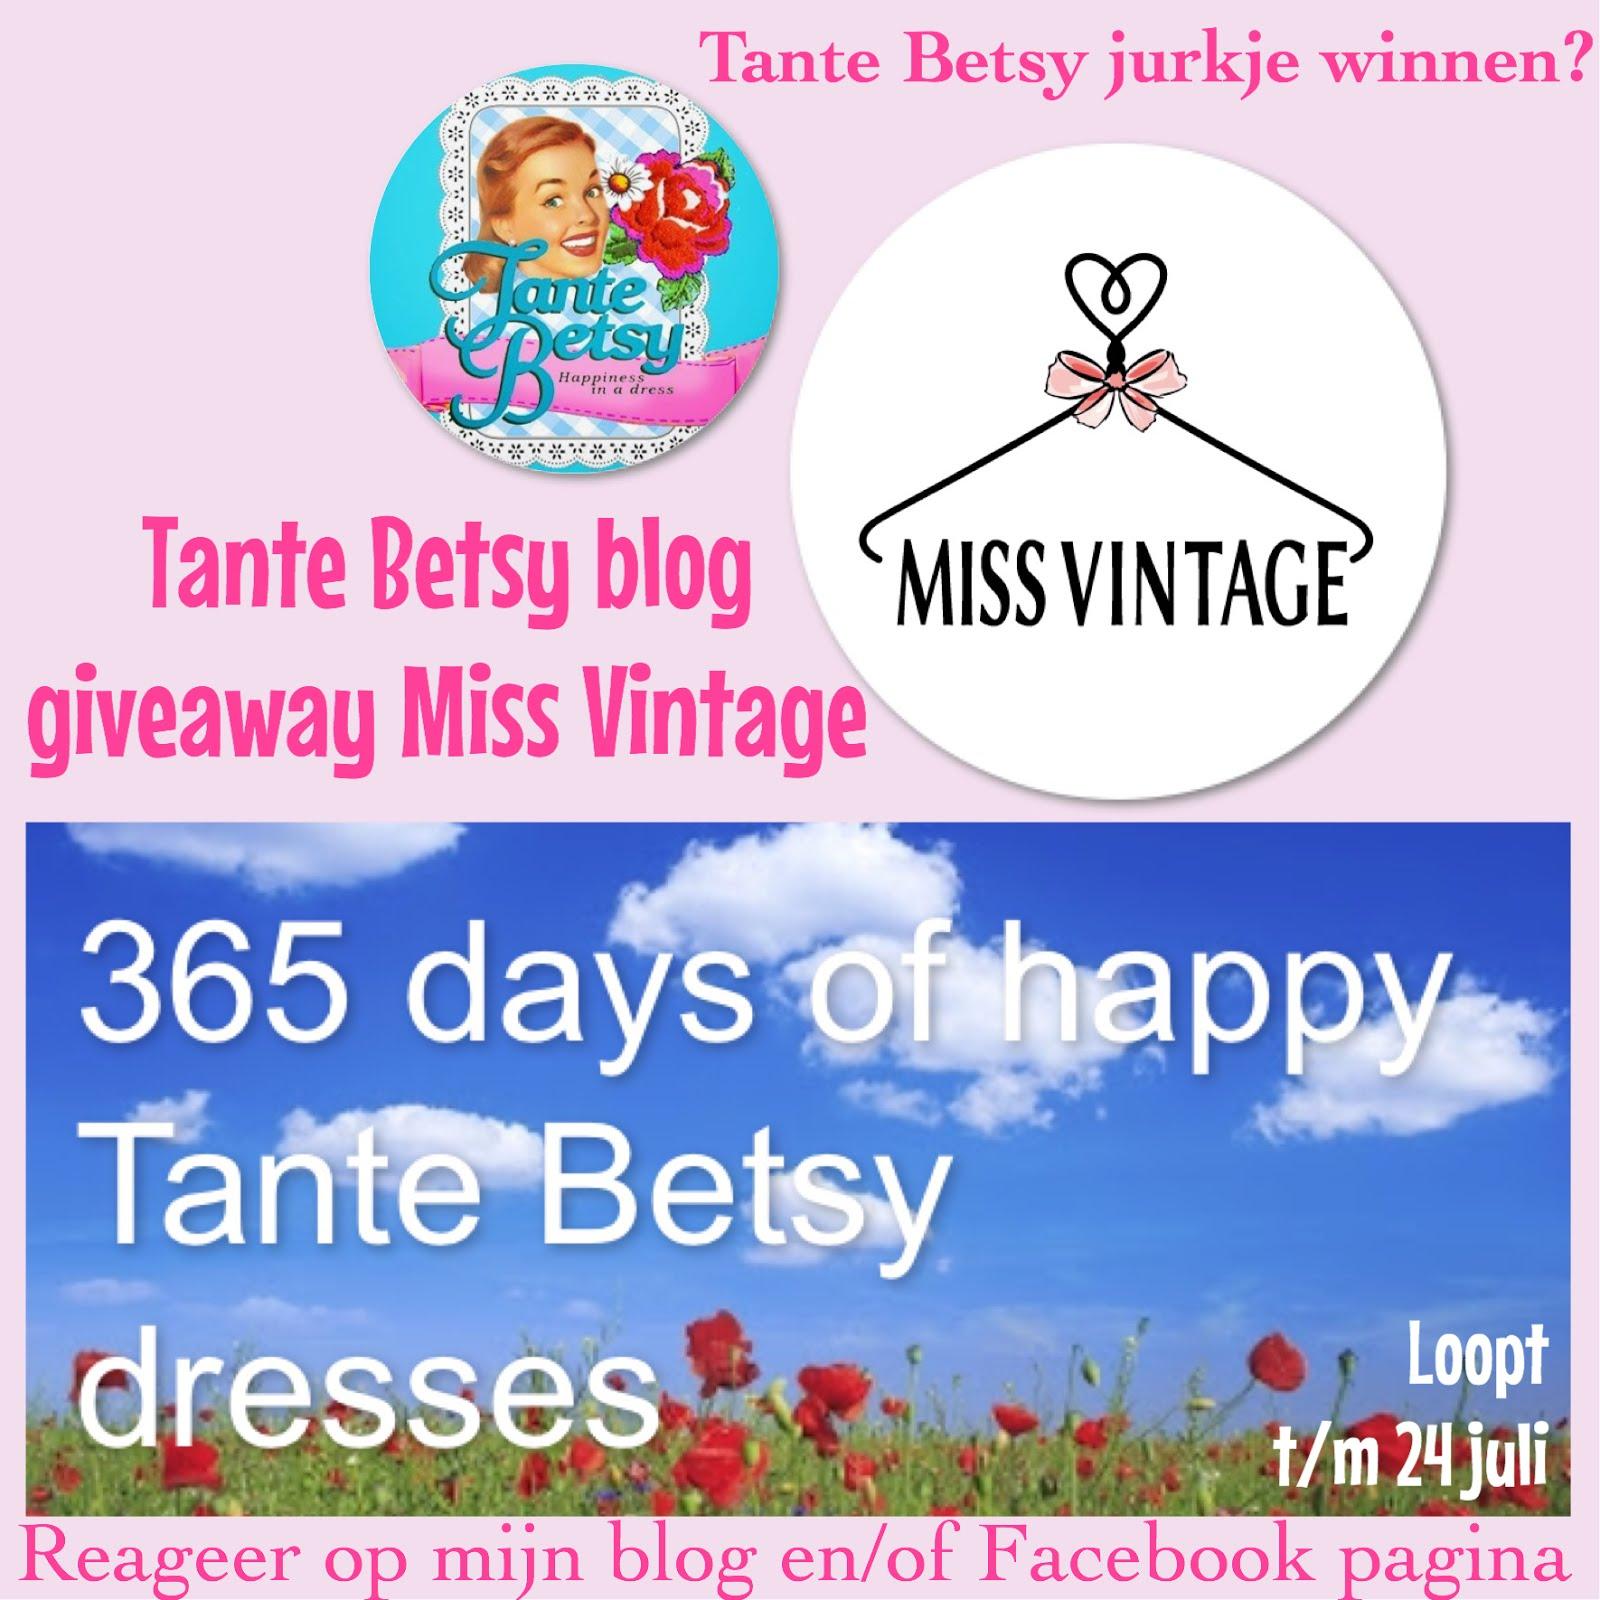 Tante Betsy blog giveaway Miss Vintage